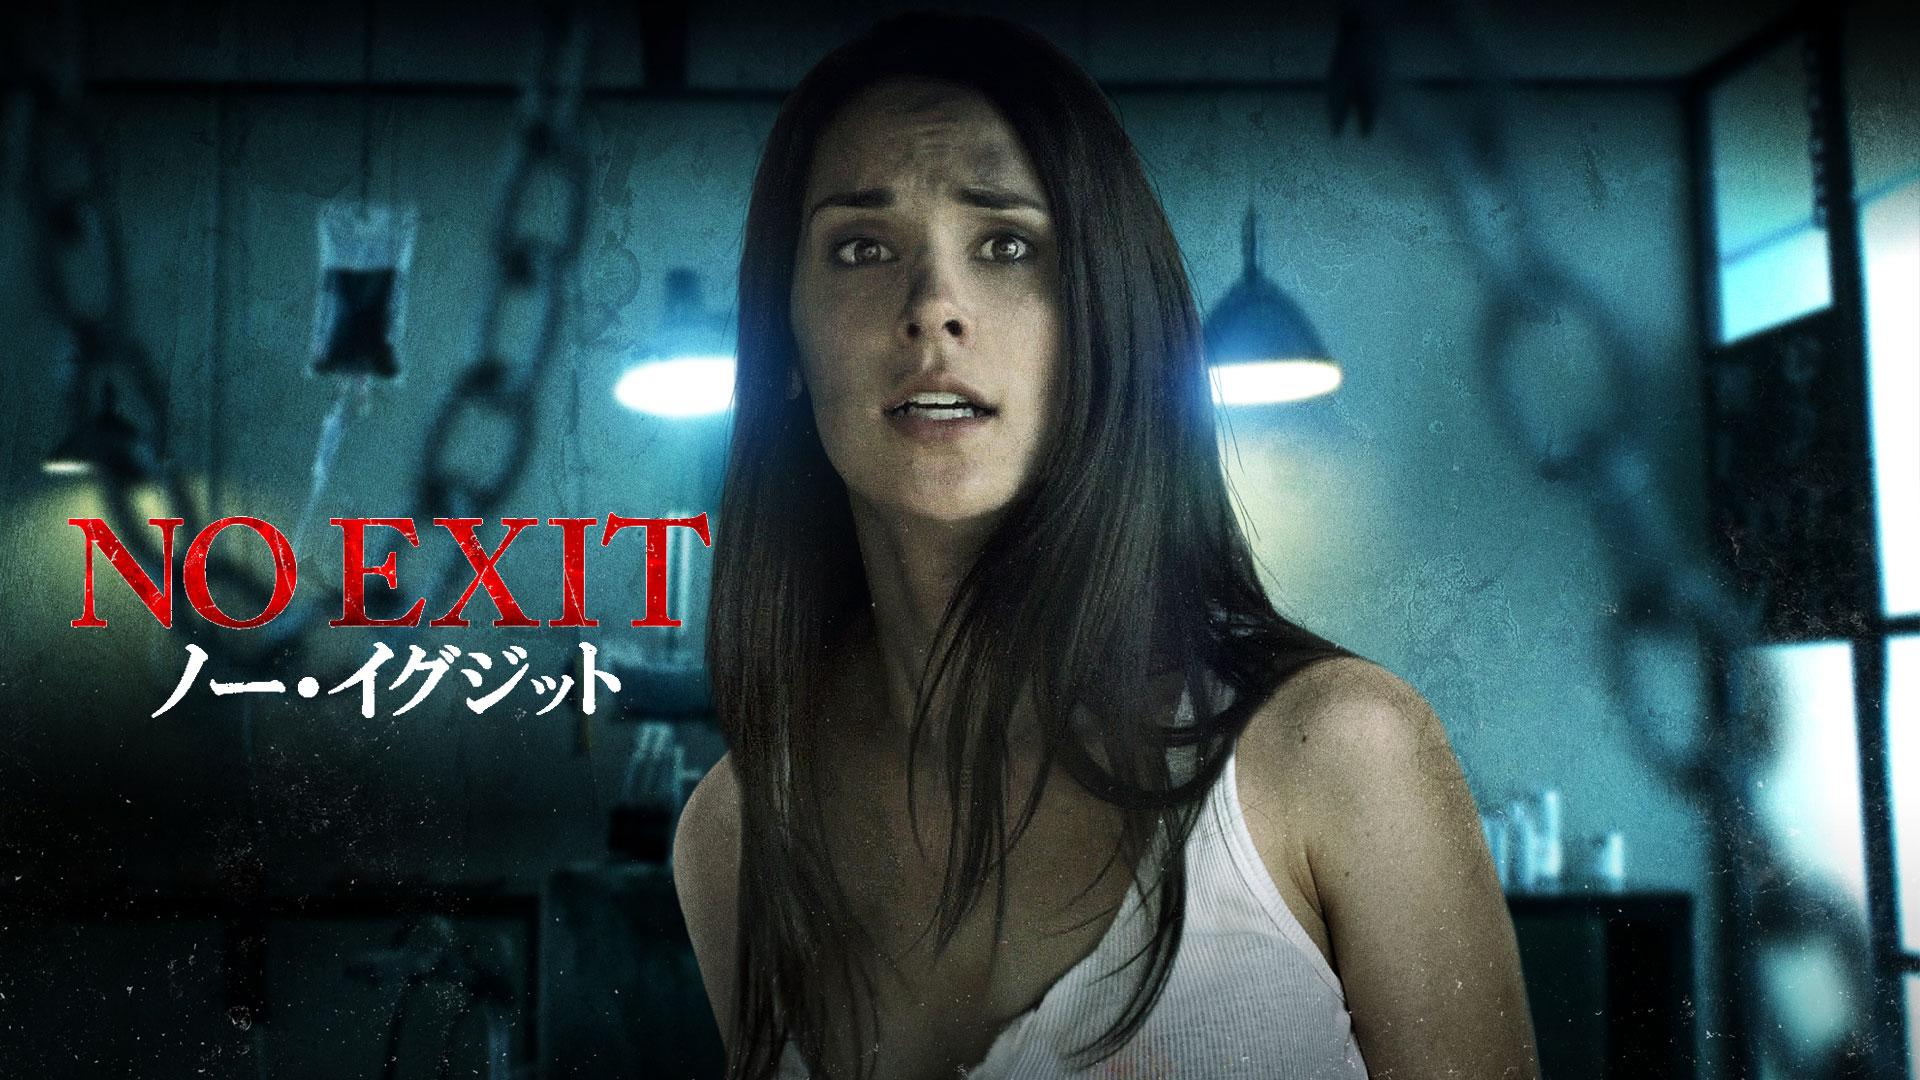 No Exit/ノー・イグジット(字幕版)